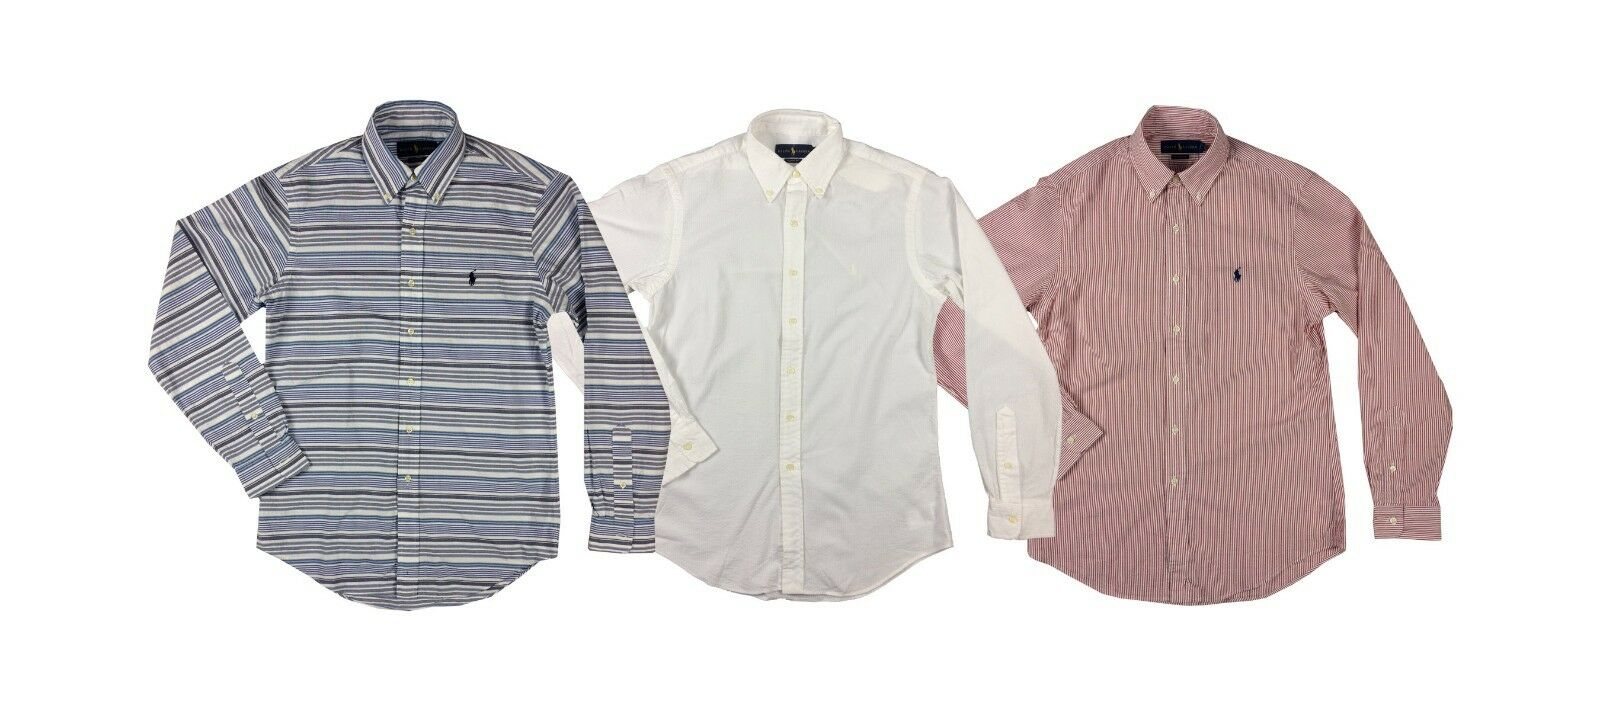 e2cd9590d488b9 Ralph Lauren Polo Mens Textured Pony Down Shirt Red White bluee New Logo  Button nwlvxj6085-Casual Shirts   Tops